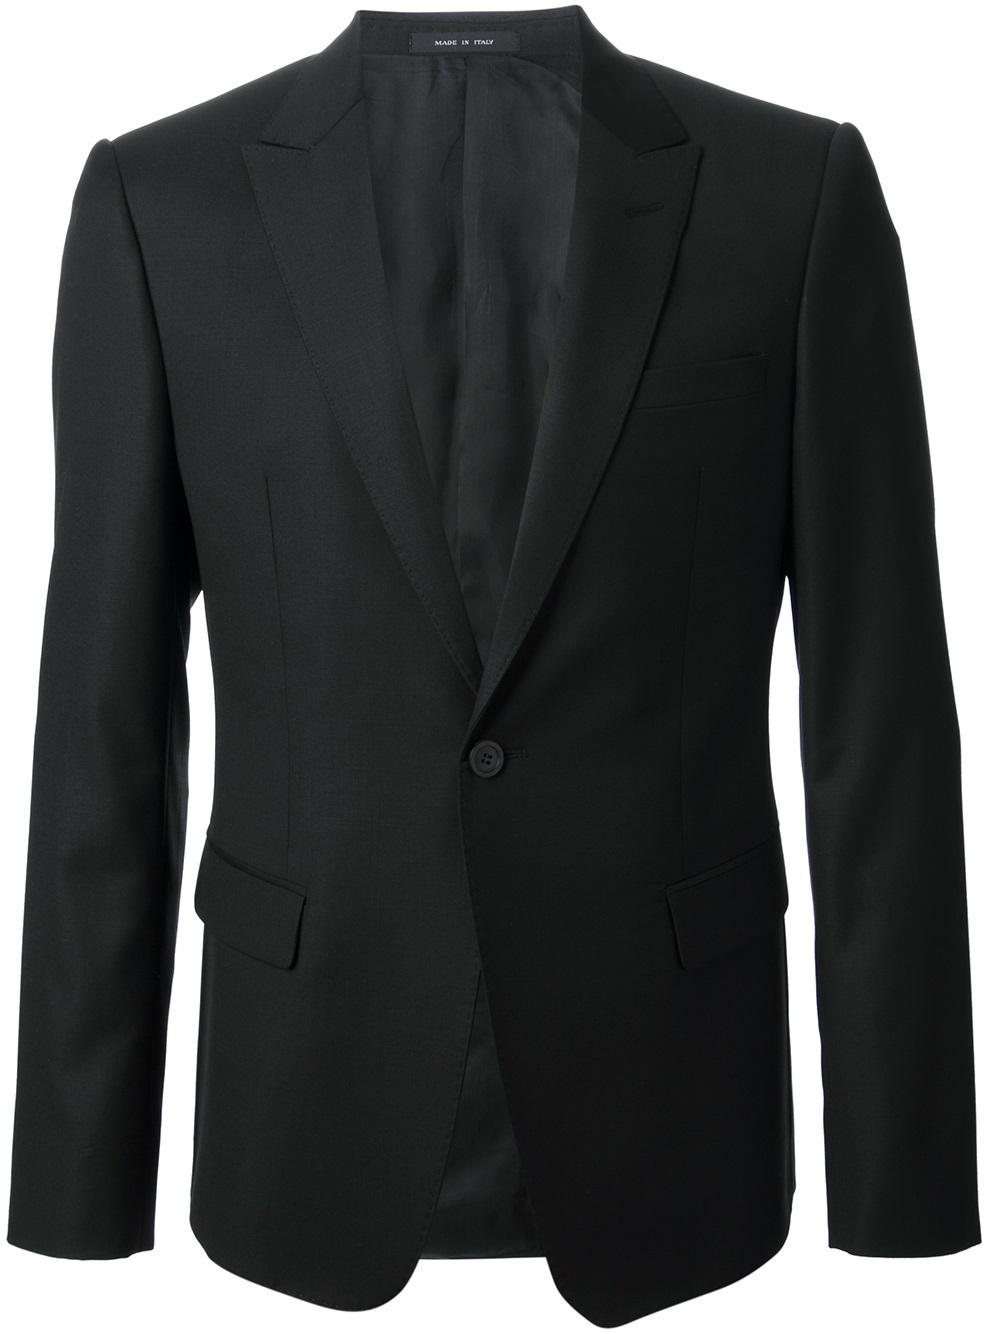 Emporio armani David Line Suit in Black for Men | Lyst